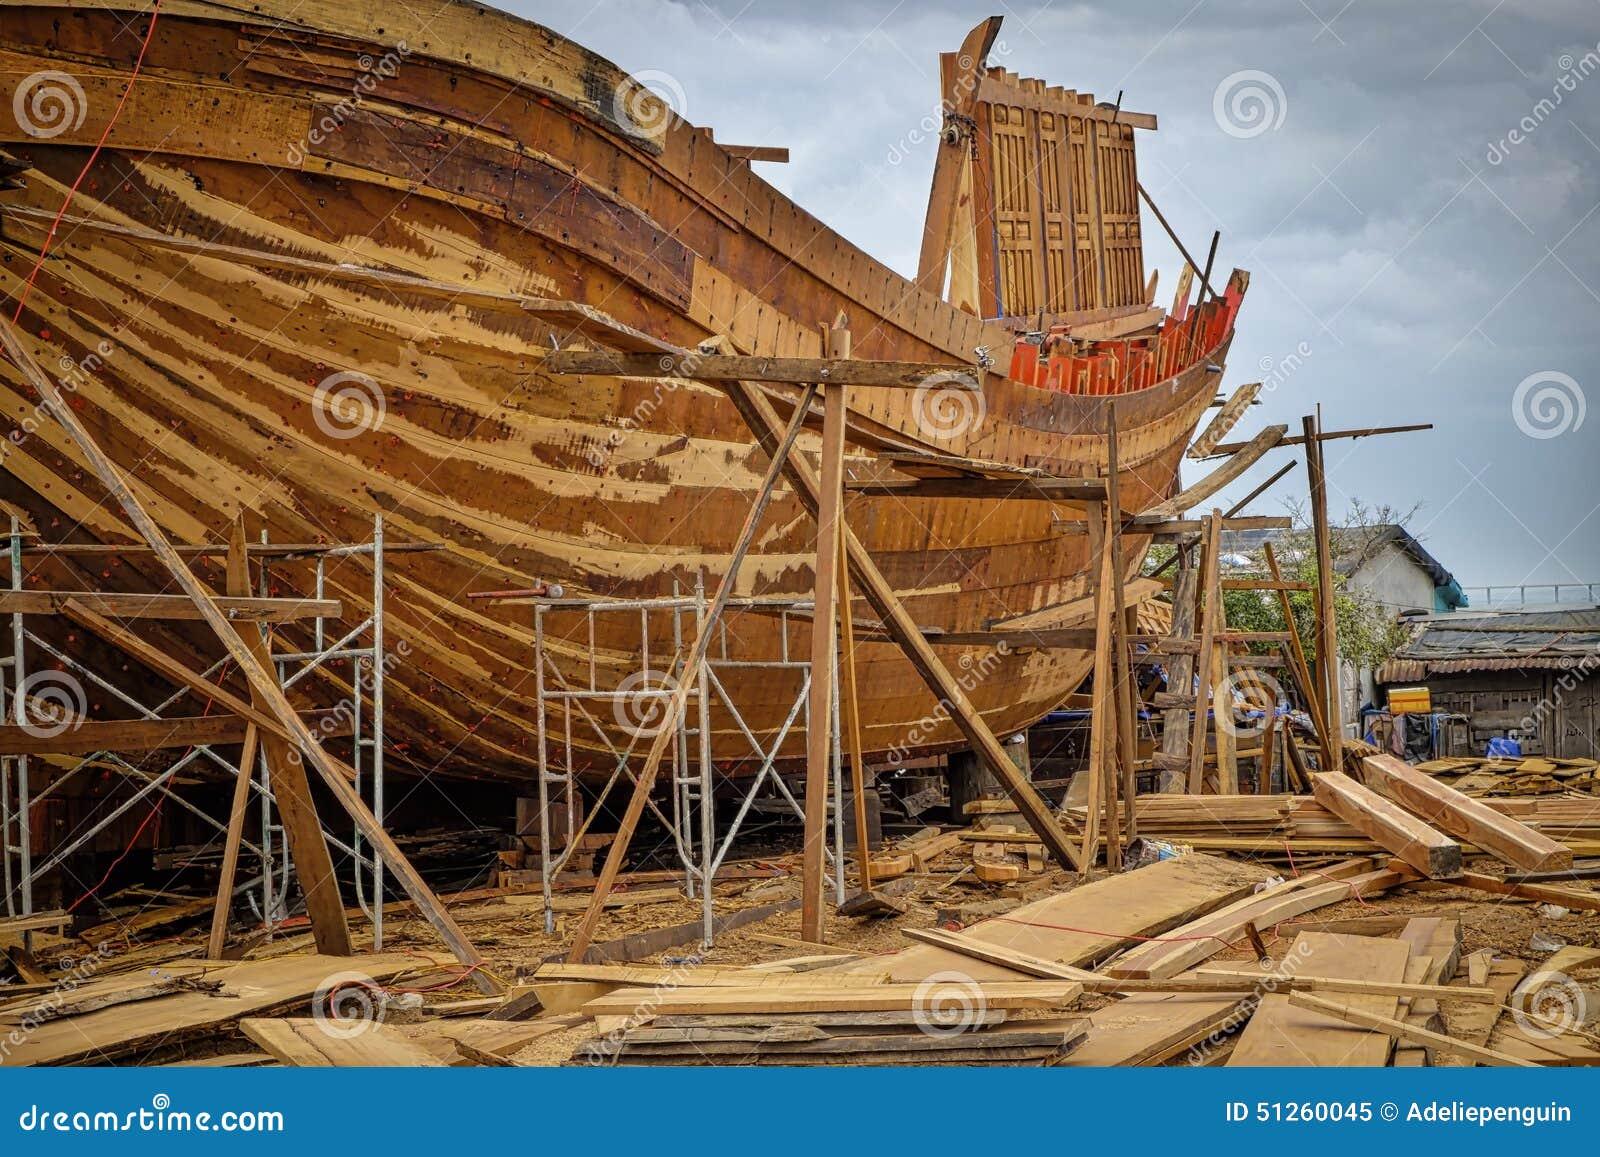 Wooden Boat Building, Qui Nhon, Vietnam Stock Image - Image: 51260045